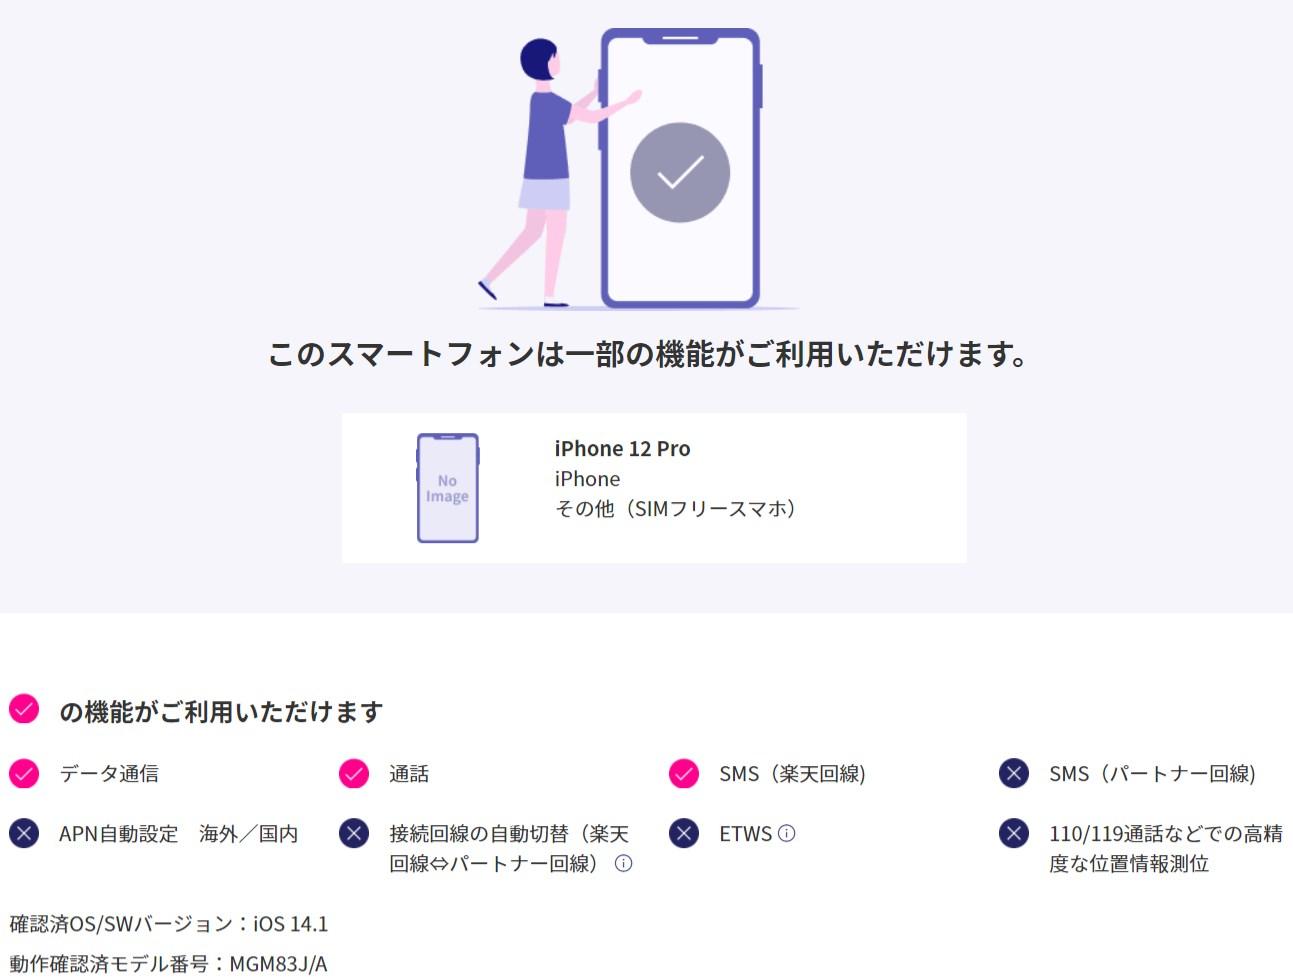 iPhone 12 Pro(SIMフリー版)楽天モバイルでの対応状況